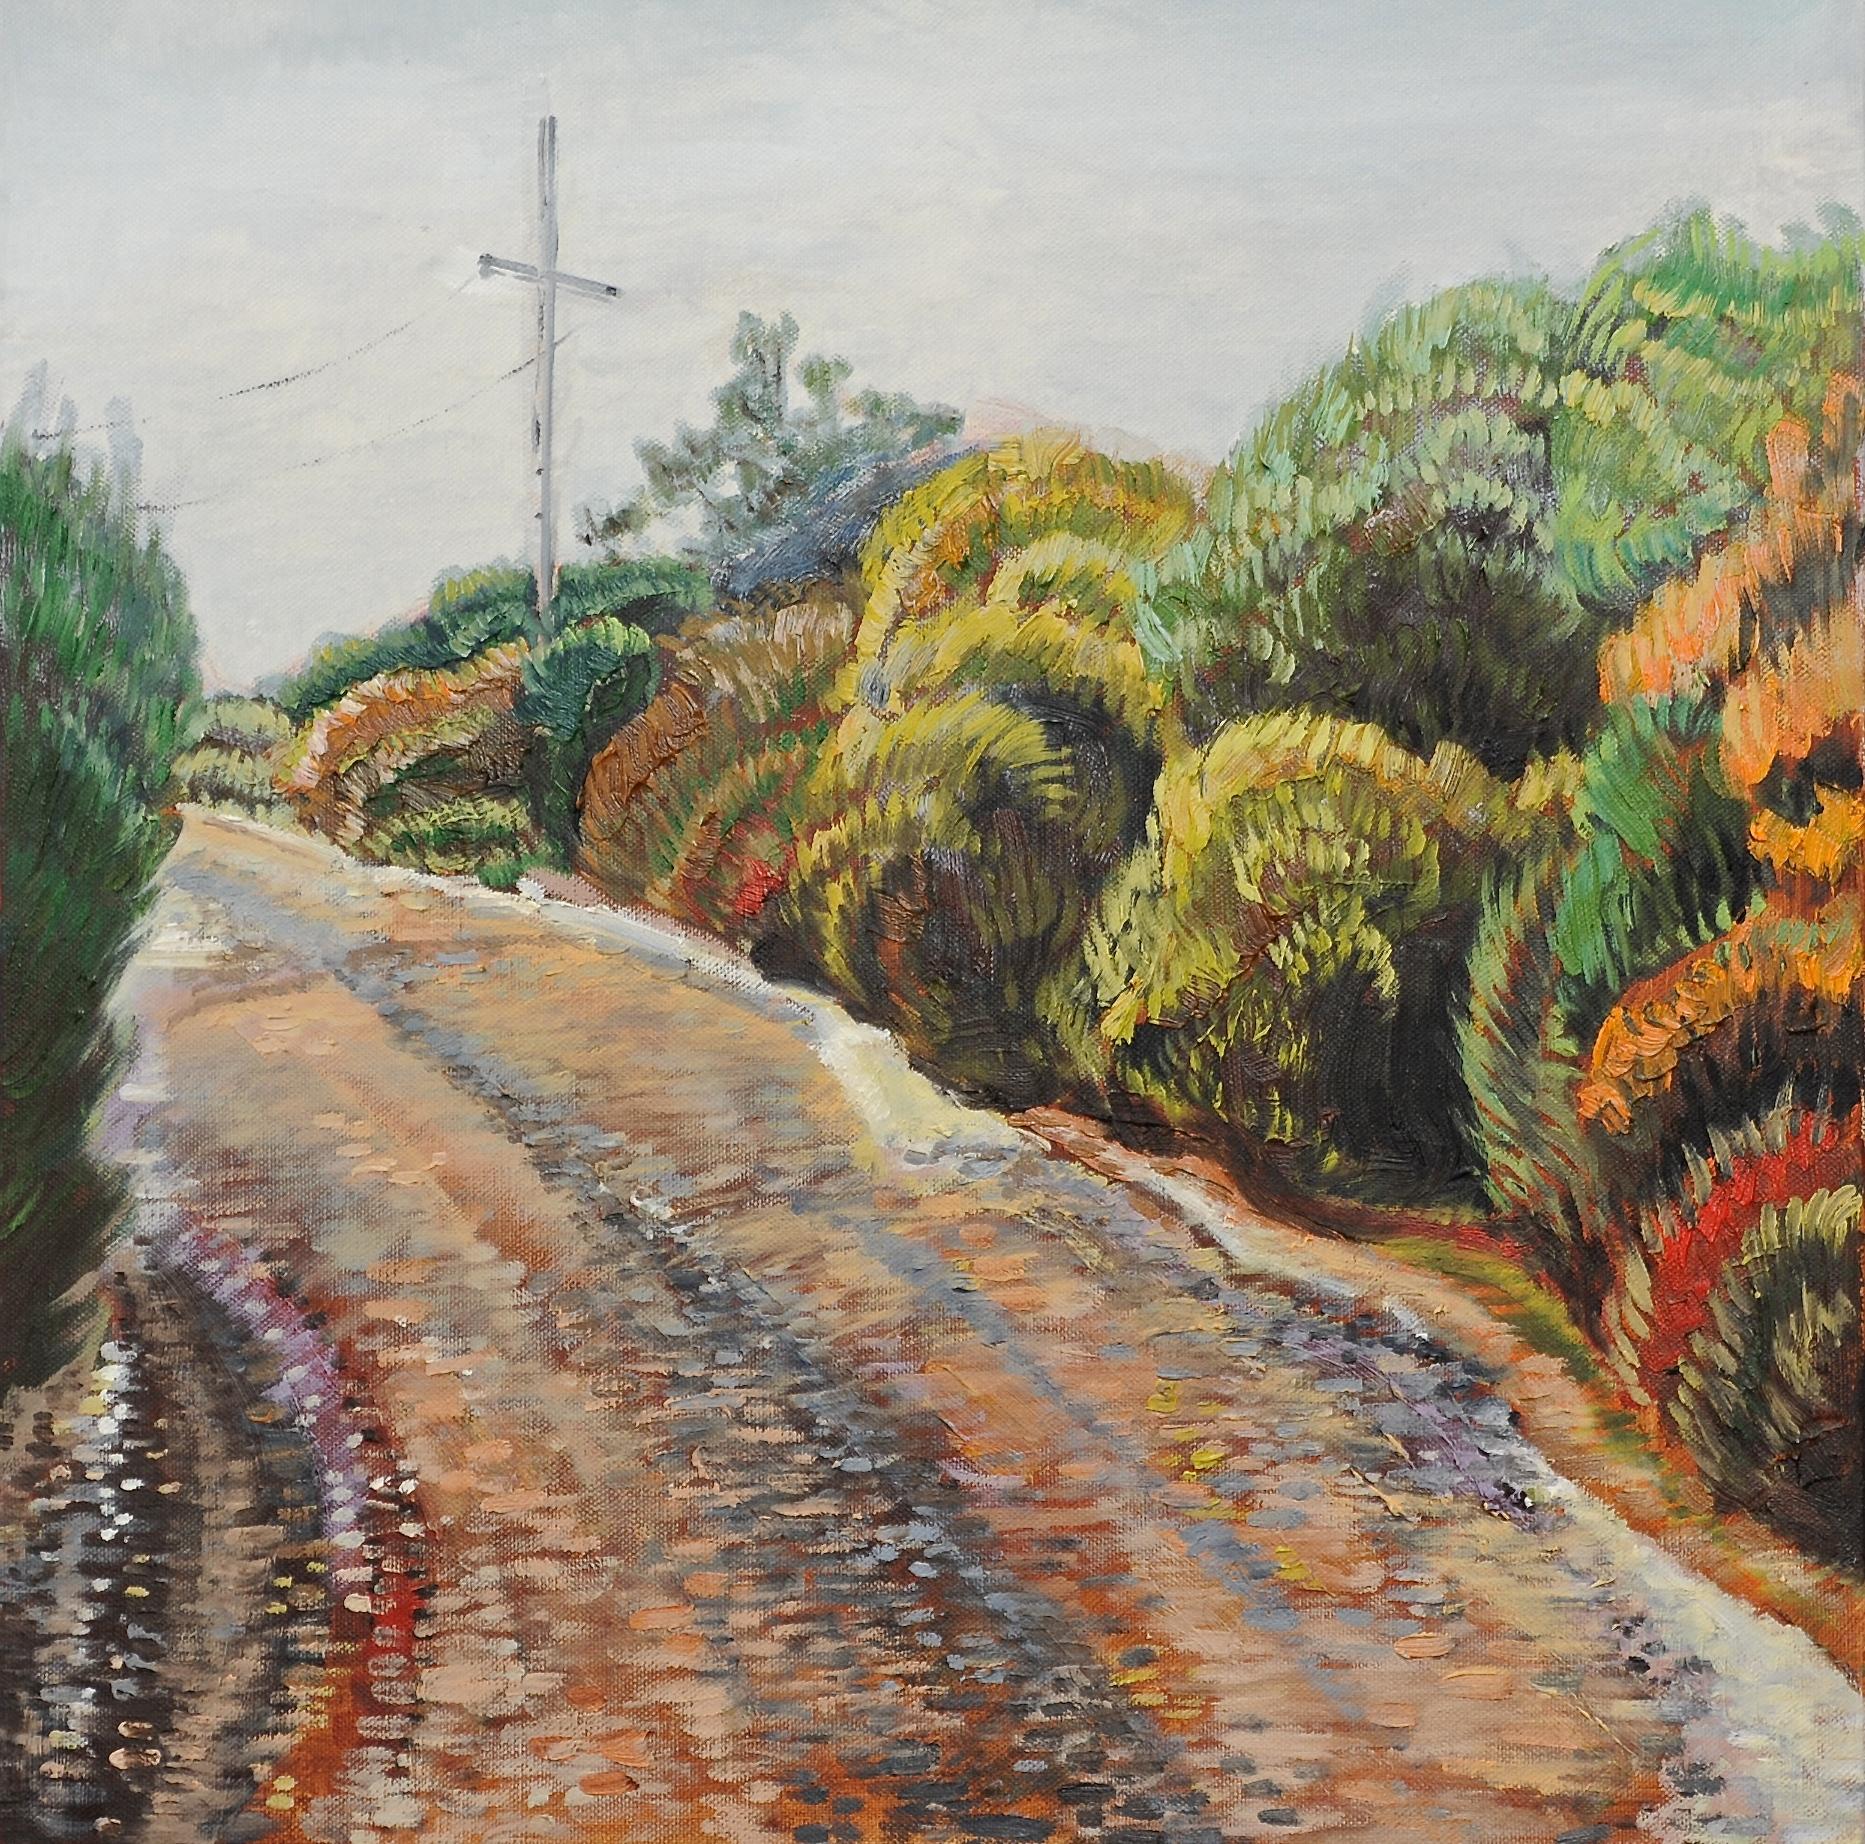 The Road, Flat Rock, 2015